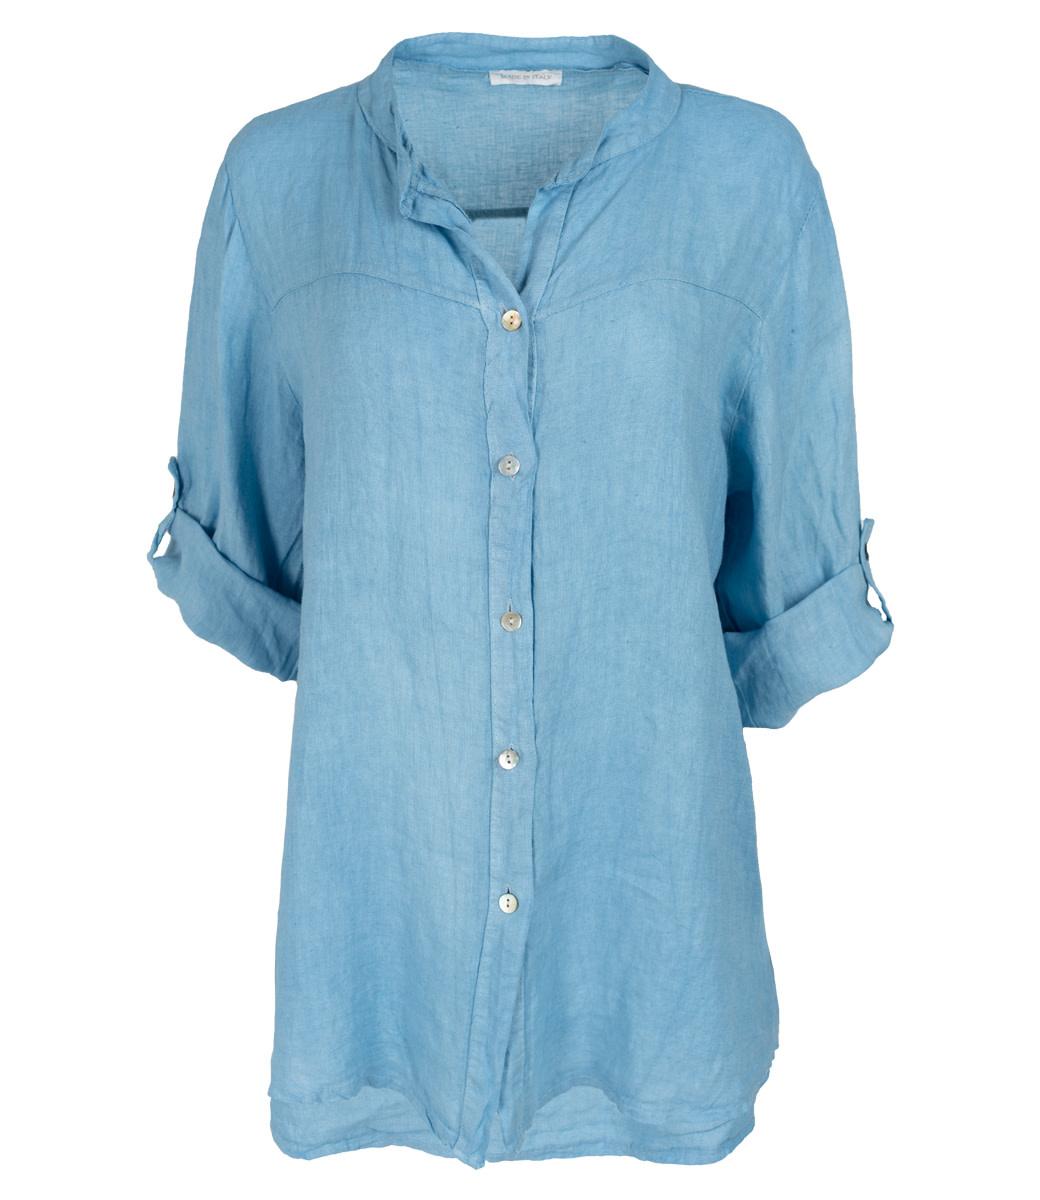 Wannahavesfashion Blouse lichtblauw linnen Rosa